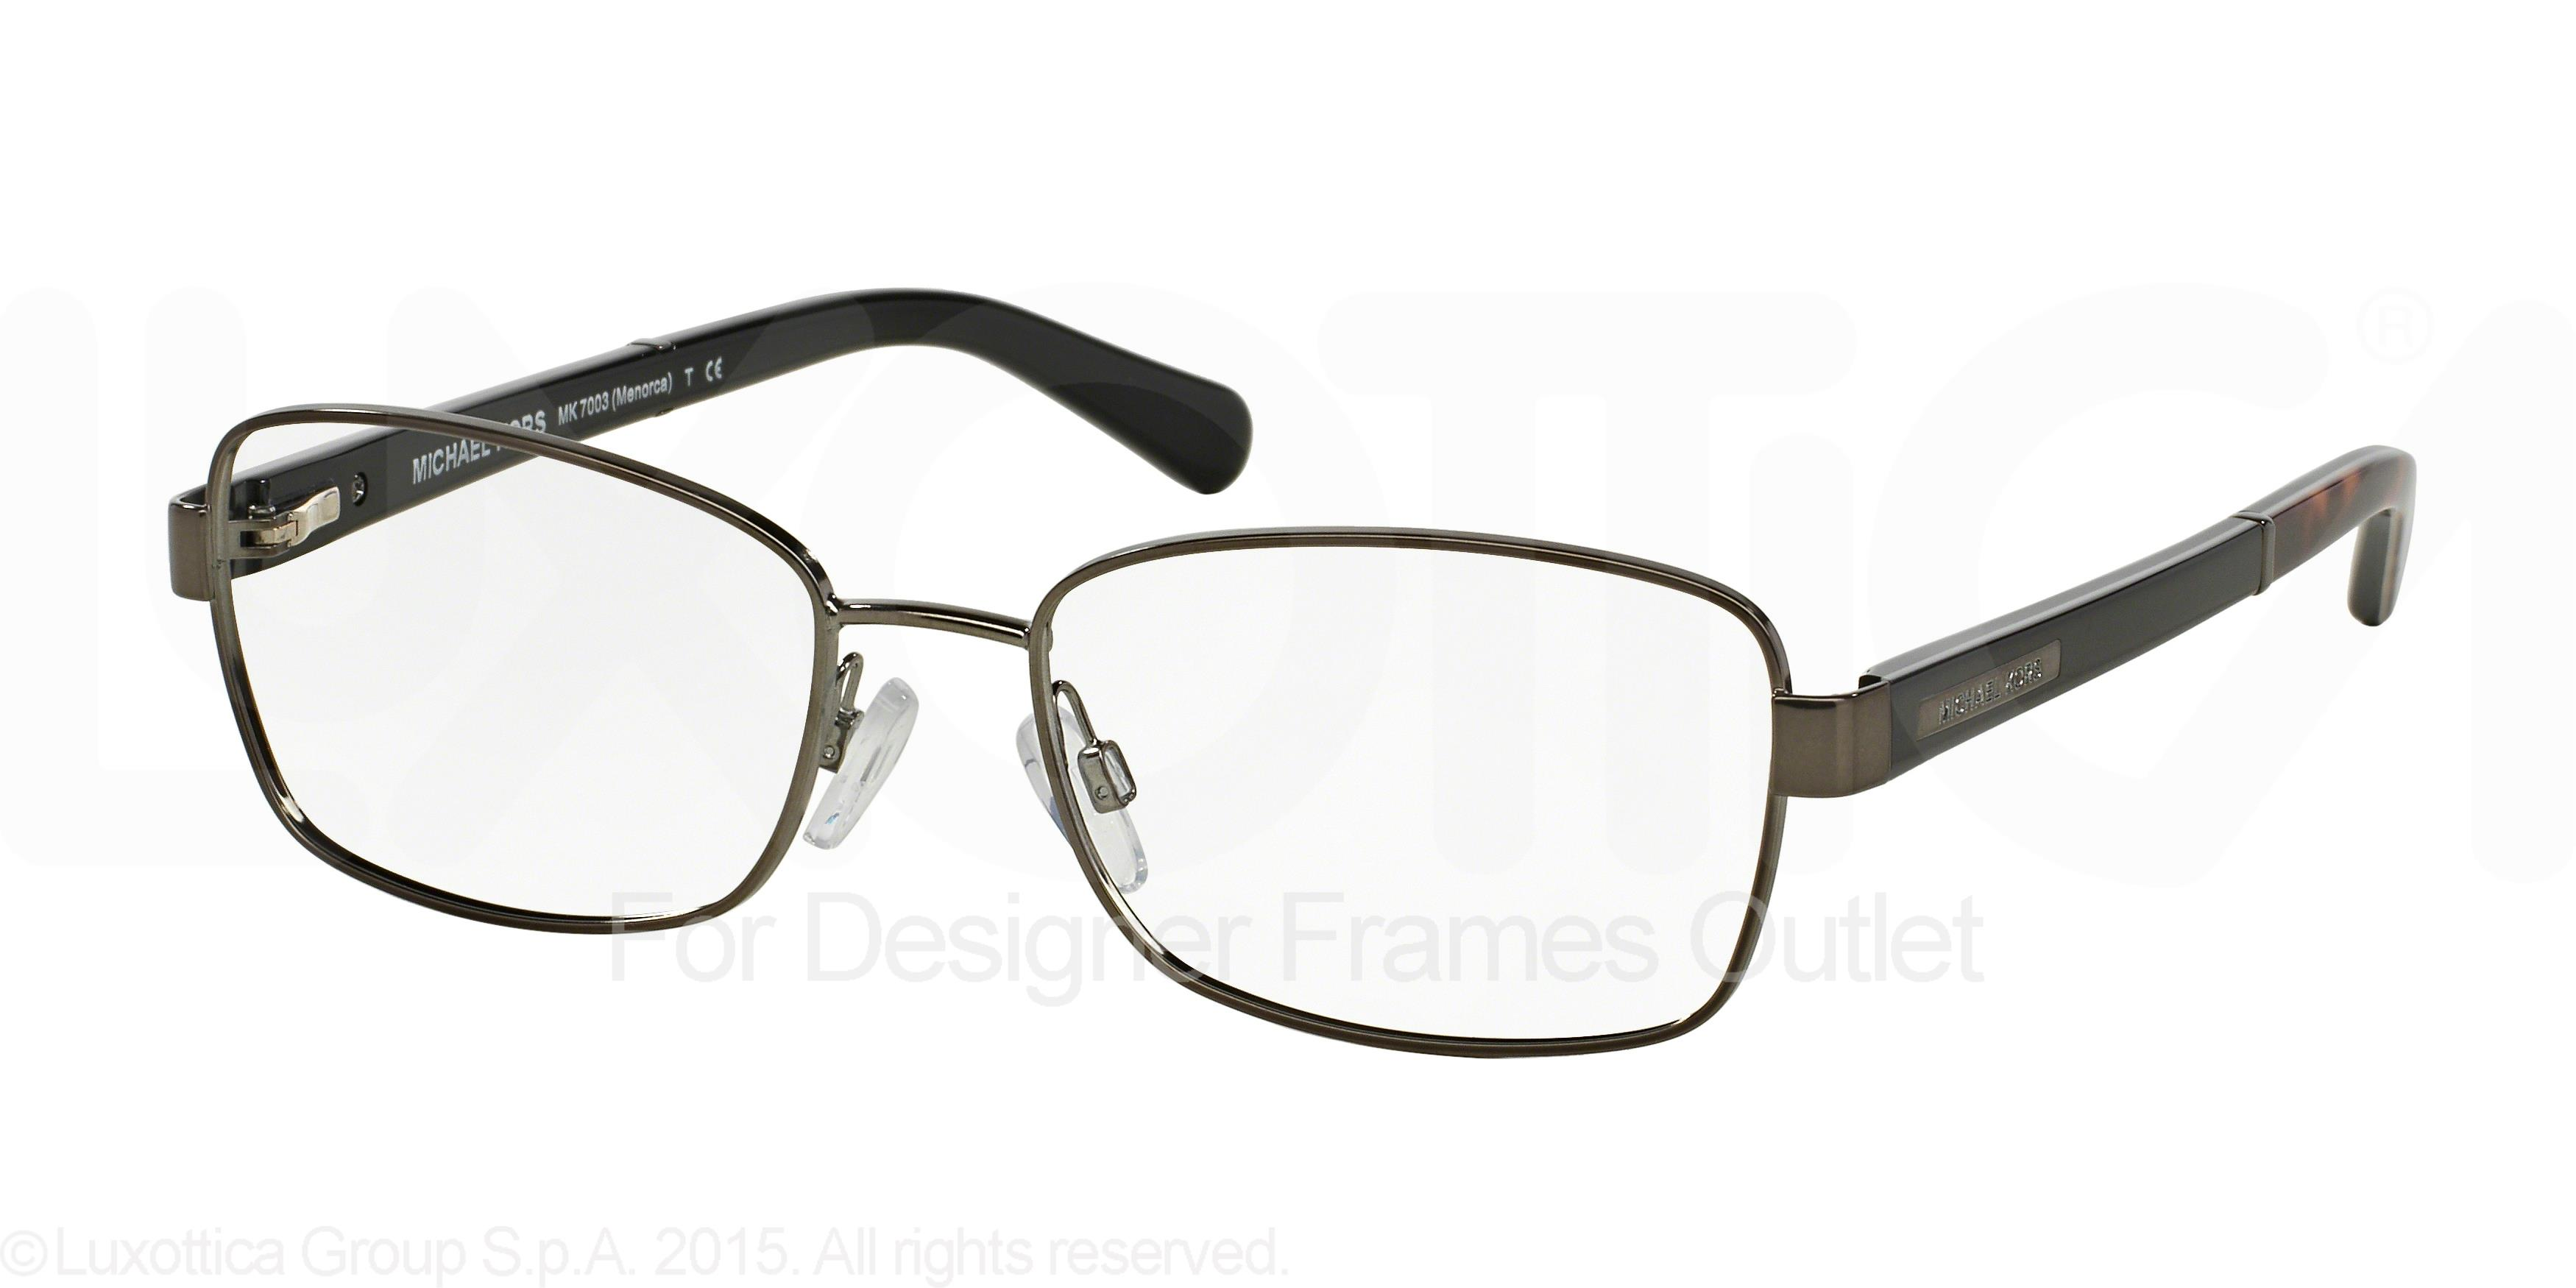 0aca9e1b7d0 Designer Frames Outlet. Michael Kors MK7003